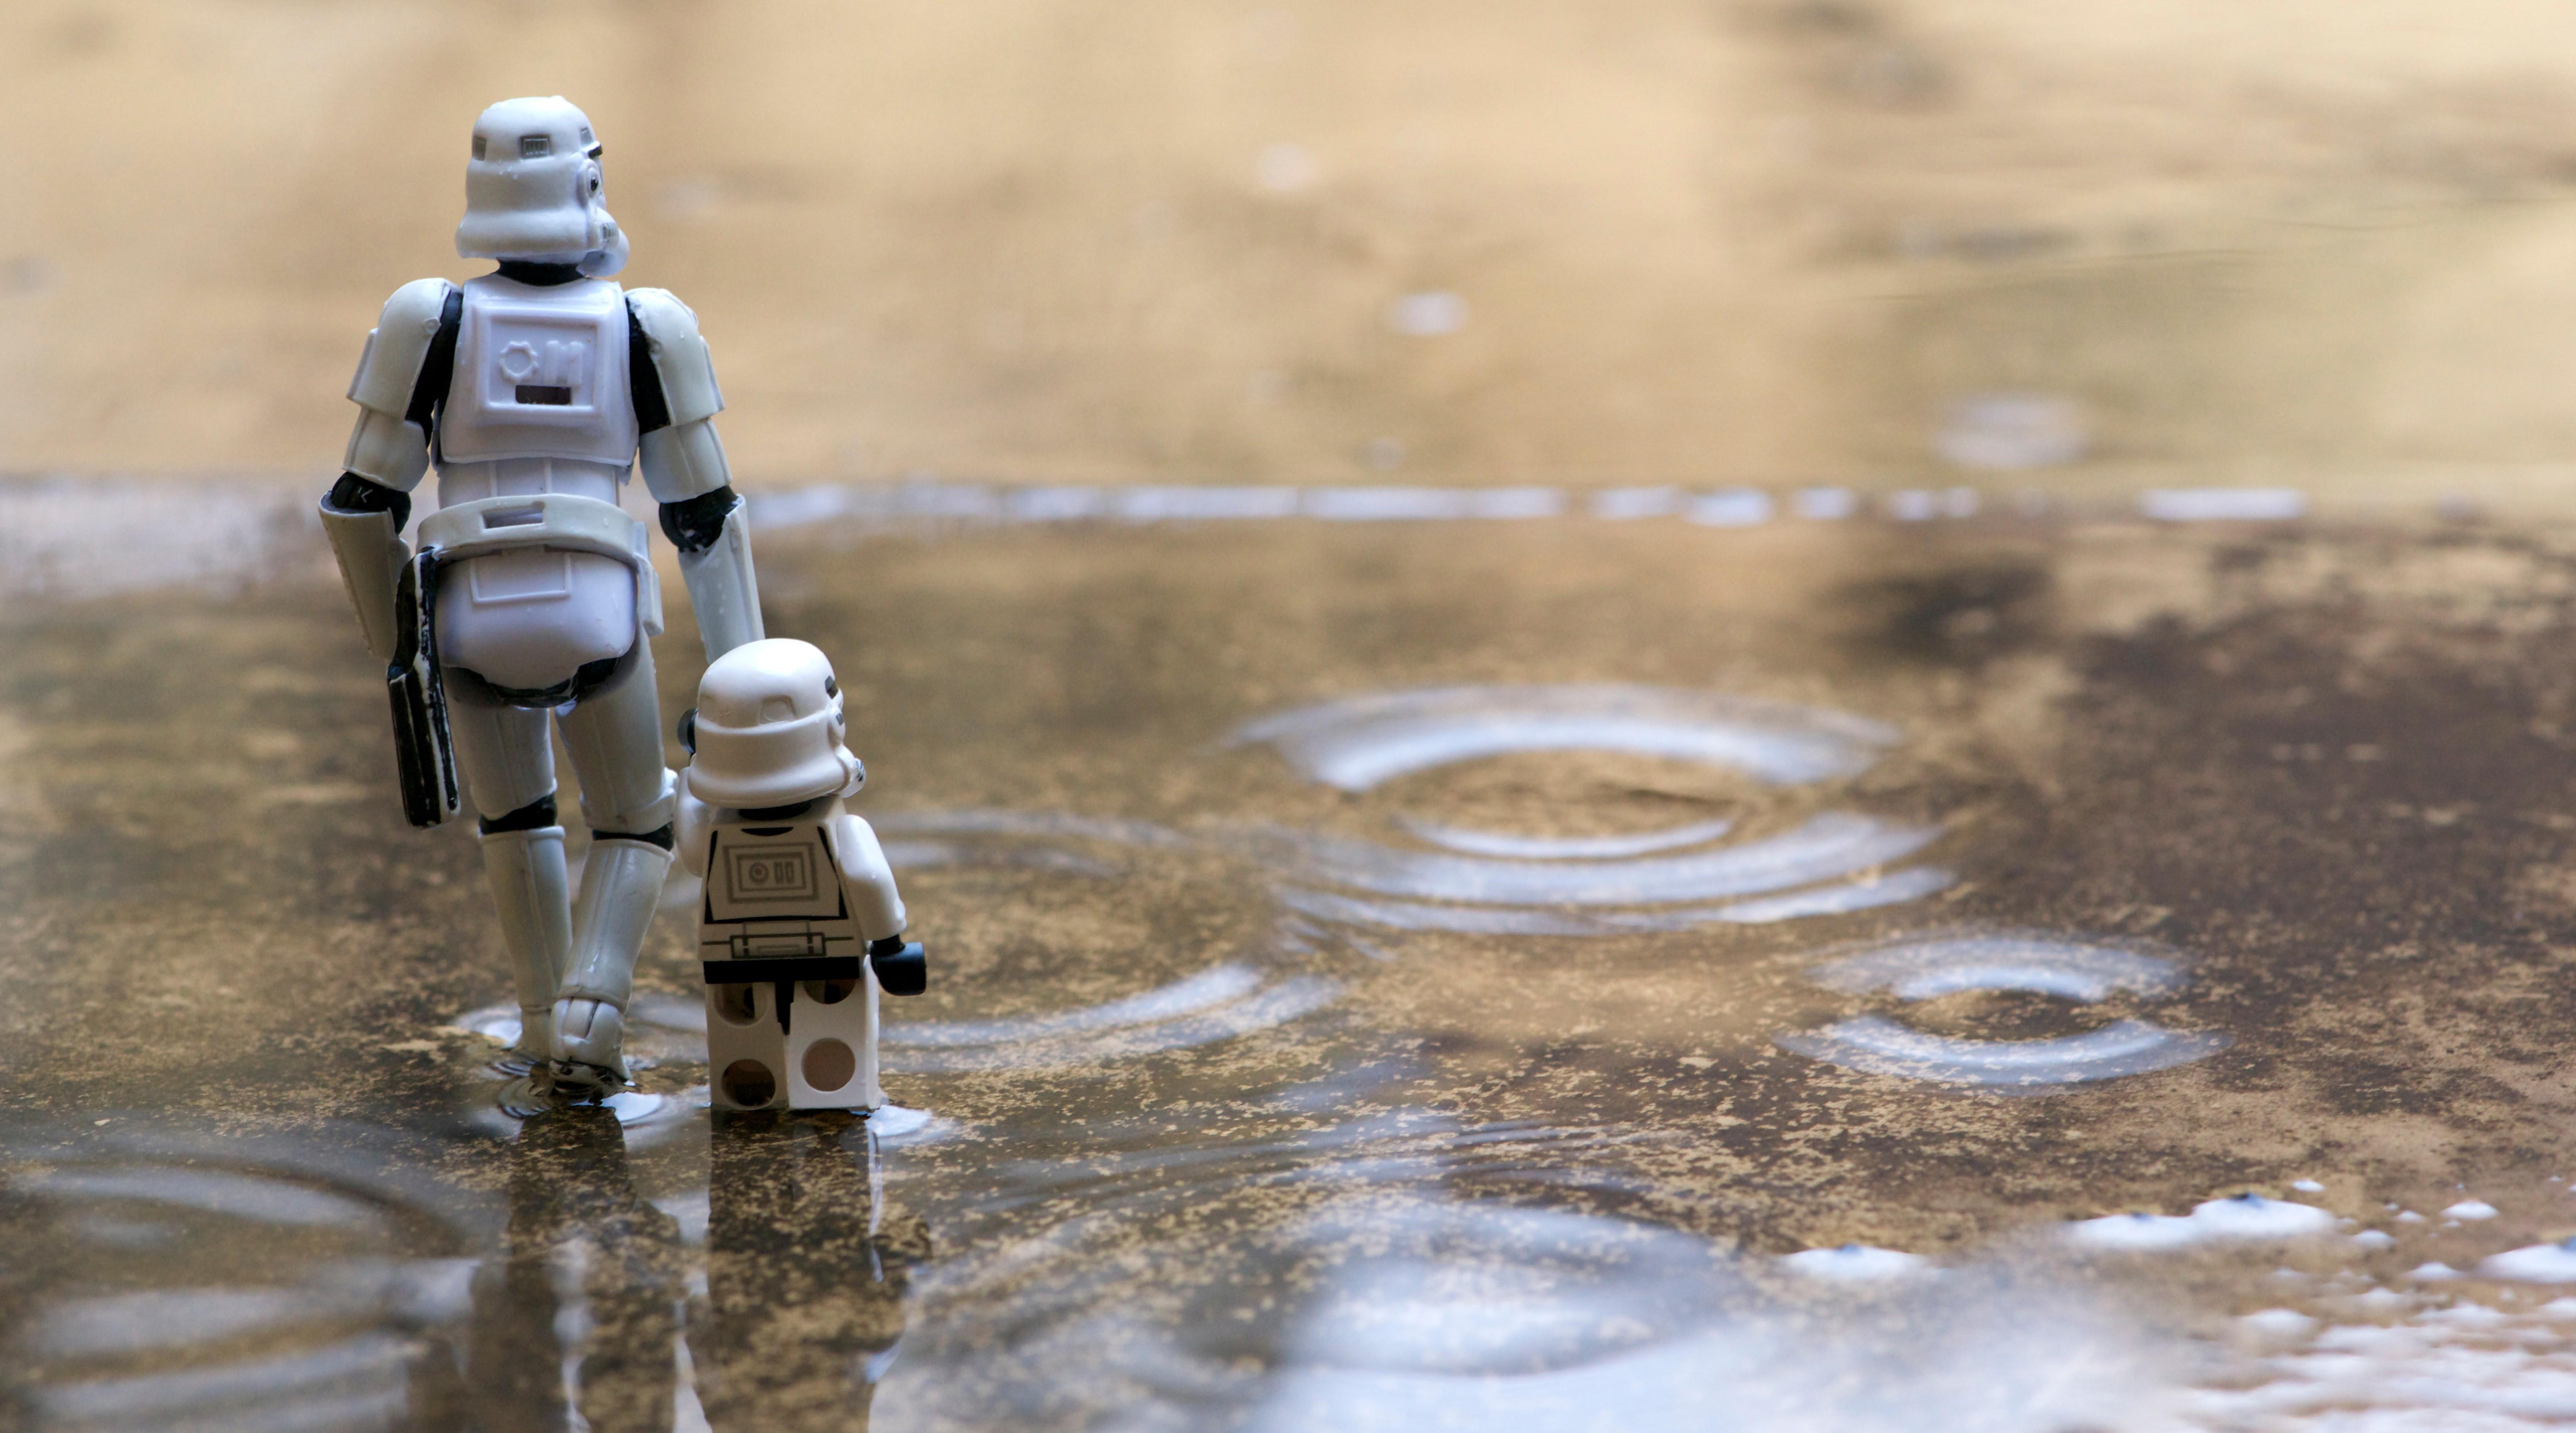 Wallpaper Star Wars Water Winter Rain Mud Lego Stormtrooper Pond Machine 6200x3450 Jeko98 95139 Hd Wallpapers Wallhere